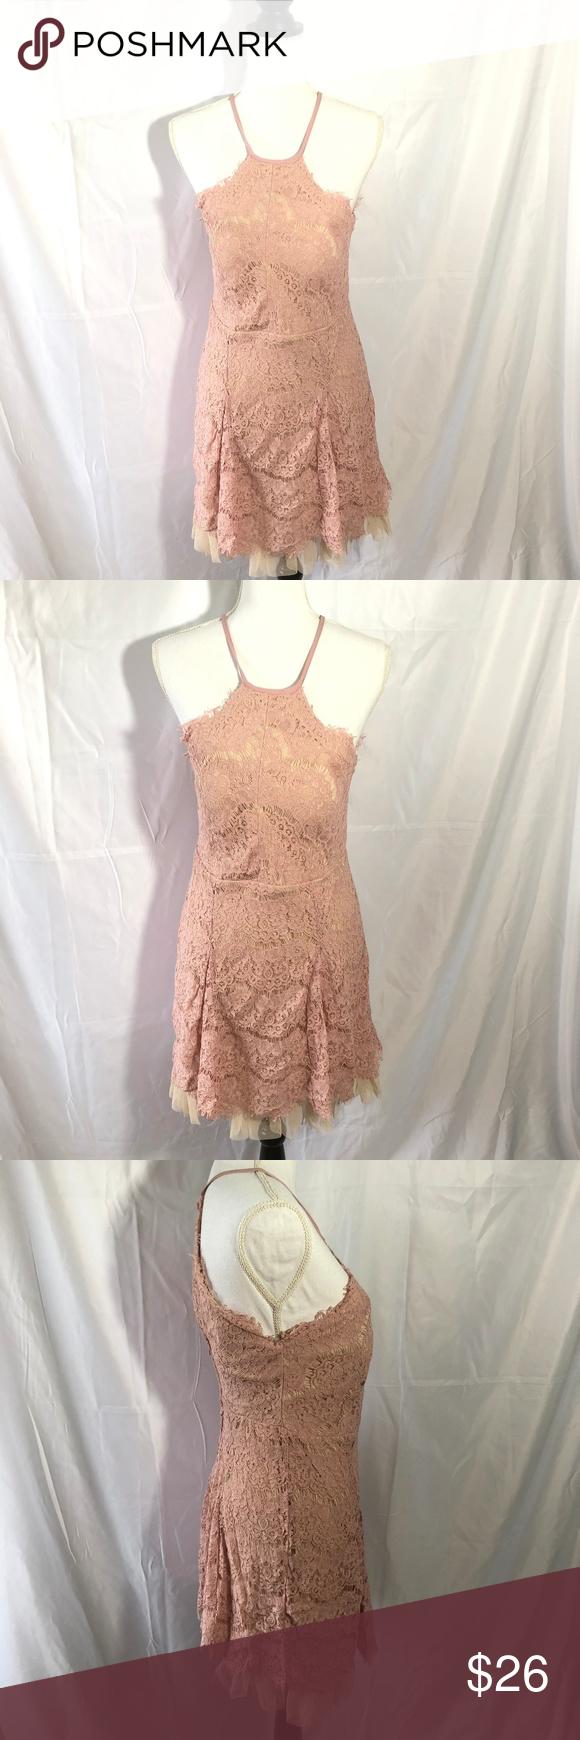 9125ab4f746 Trixxi Rose Pink Halter Top Ruffle Lace Dress L Trixxi Junior Womens Rose  Pink Size Large